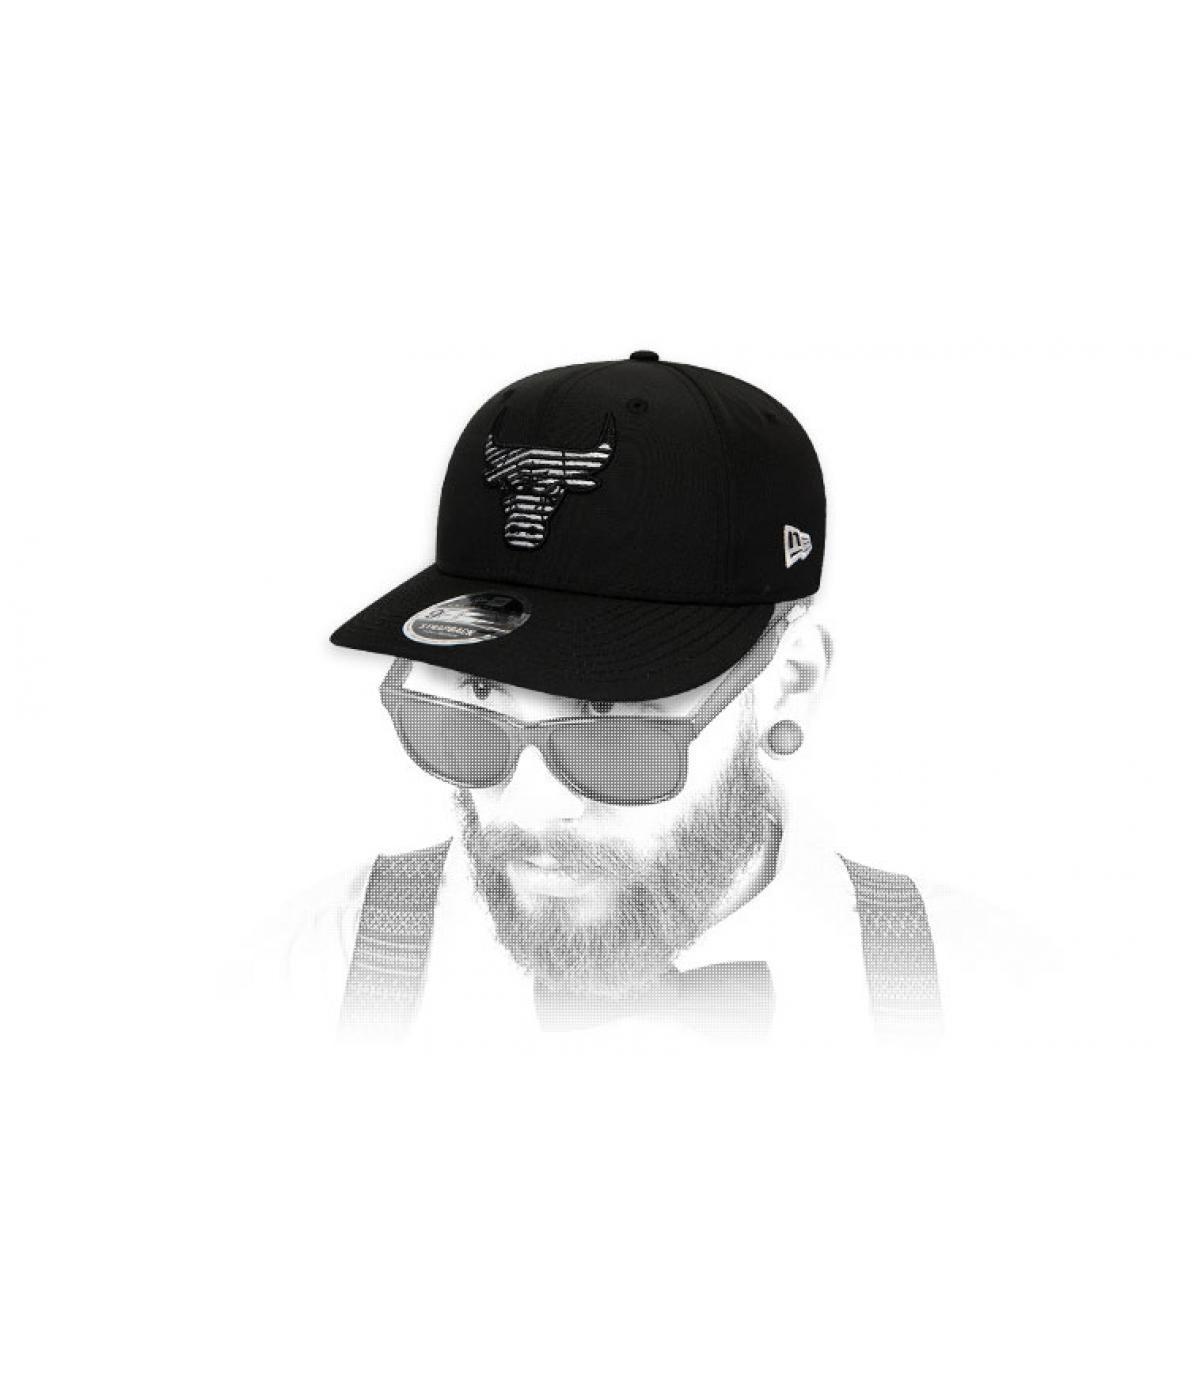 black Bulls snapback striped logo